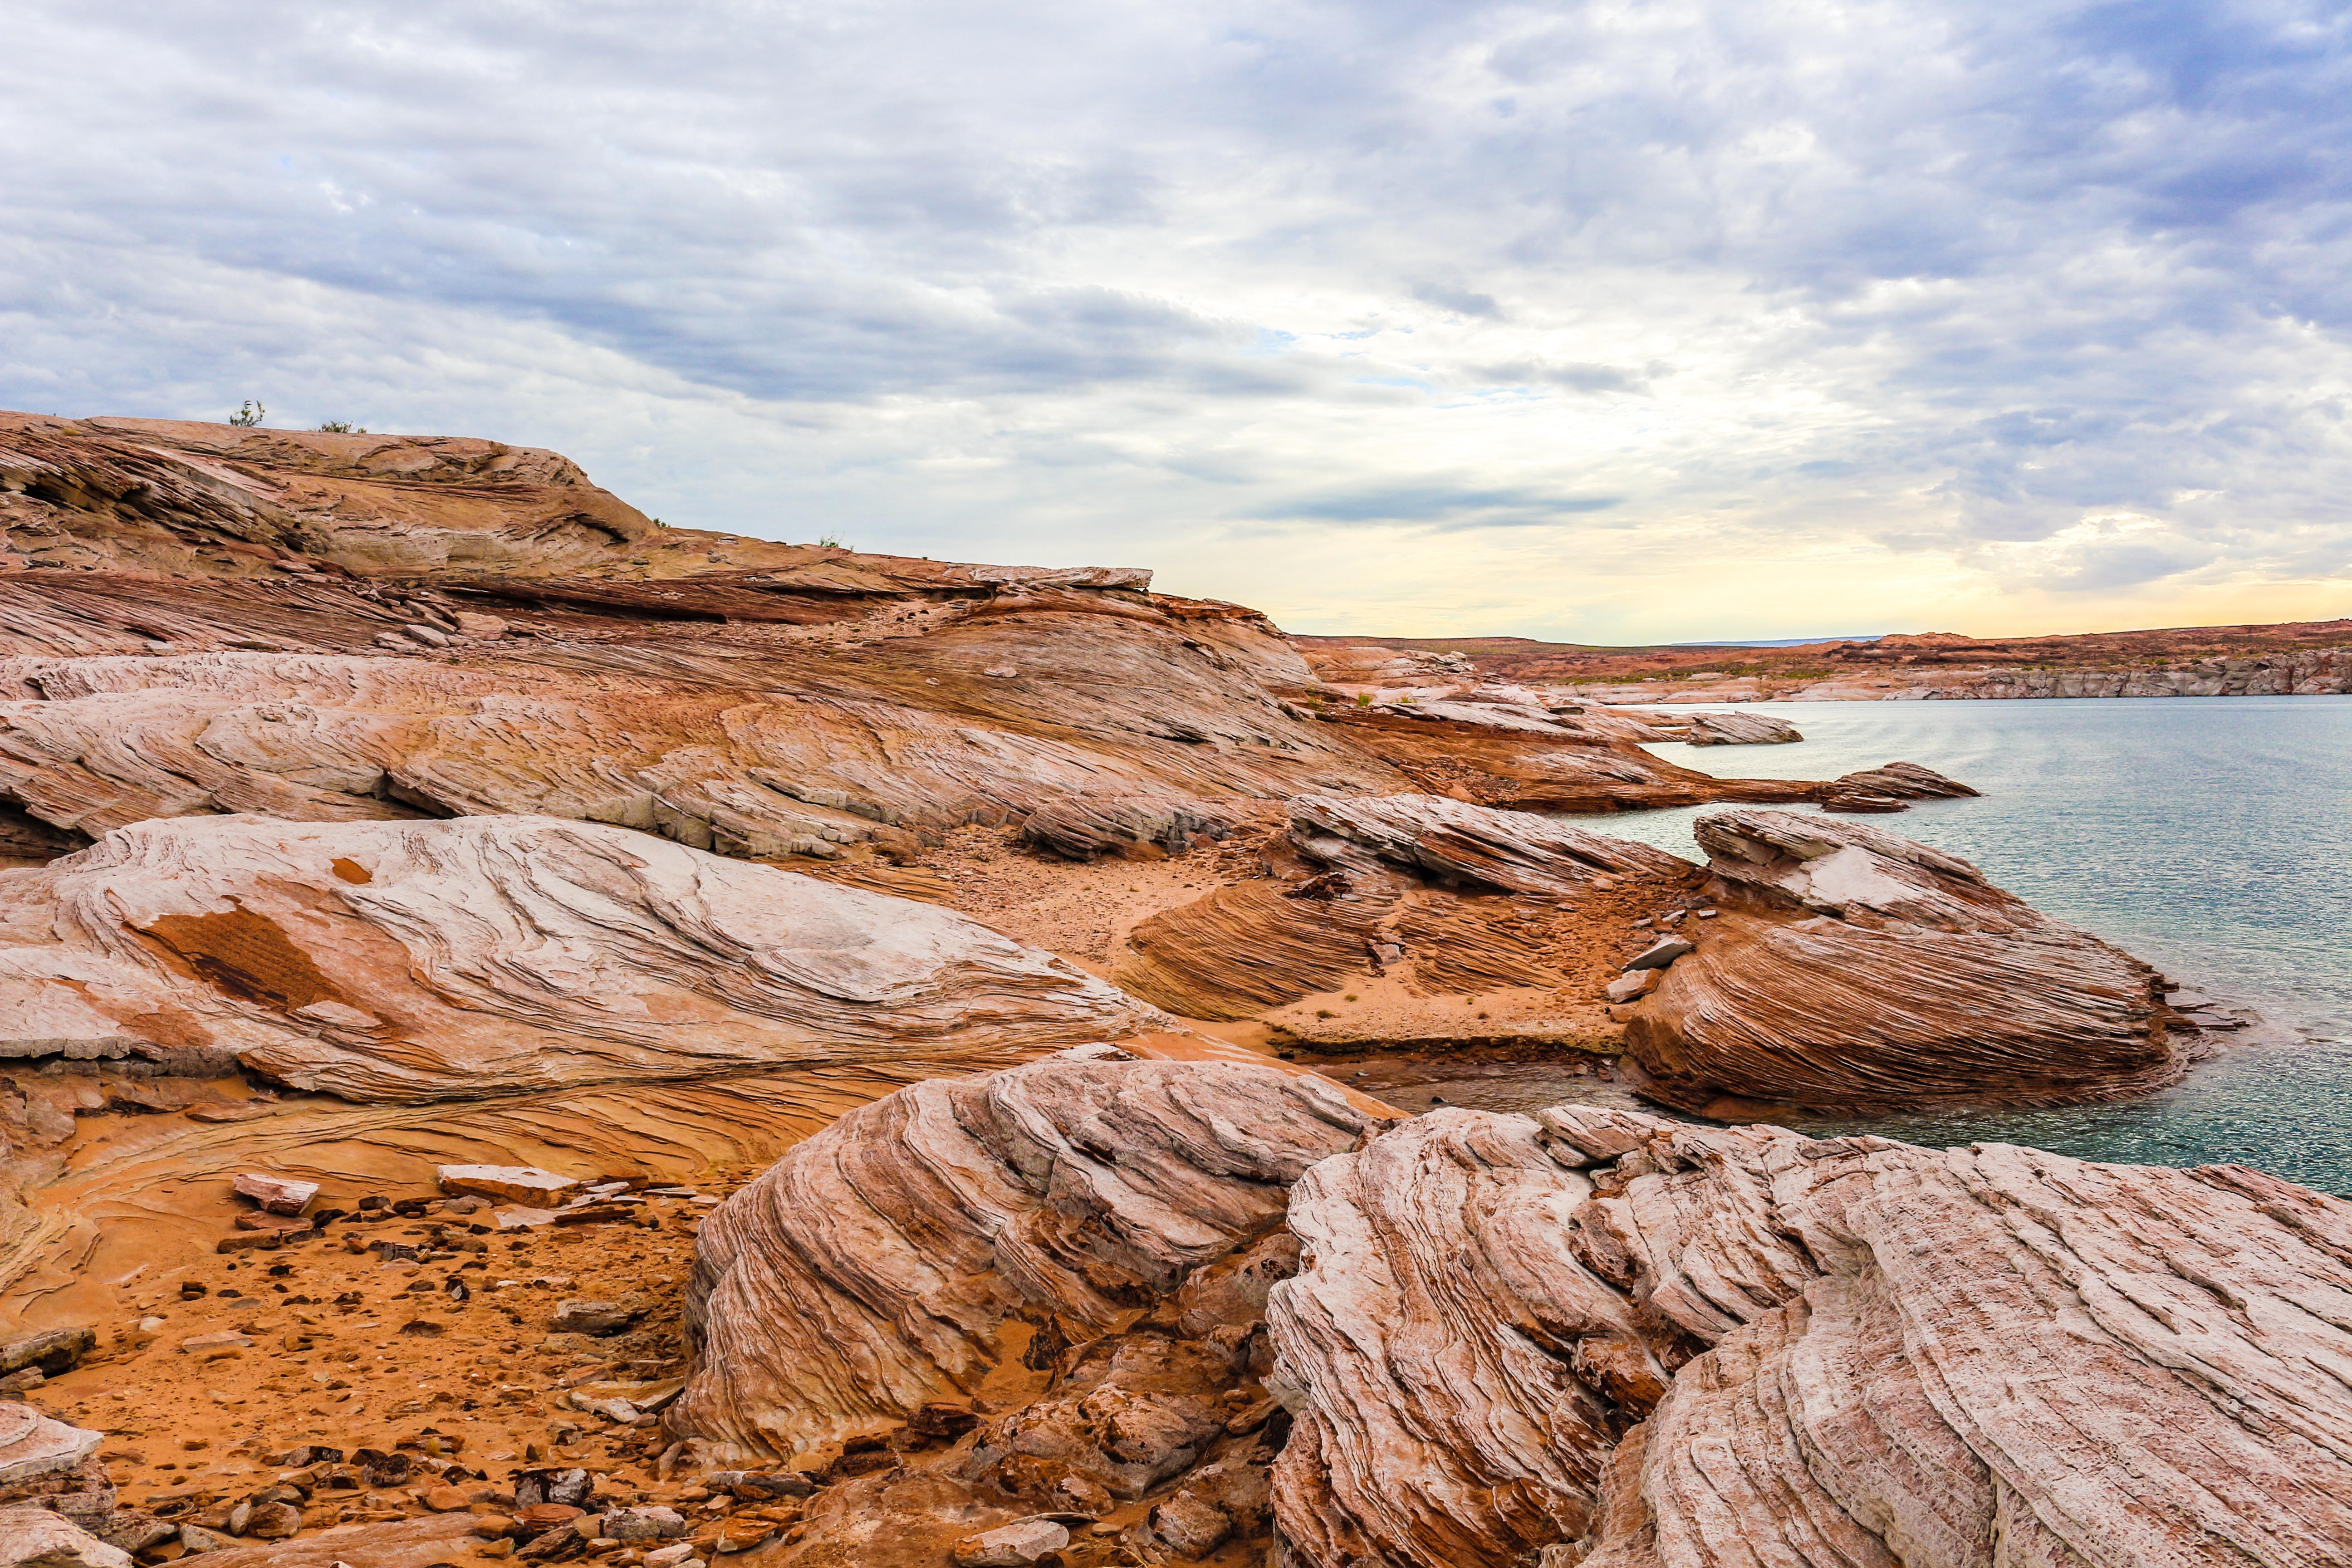 Rugged and arid shoreline of a desert lake.